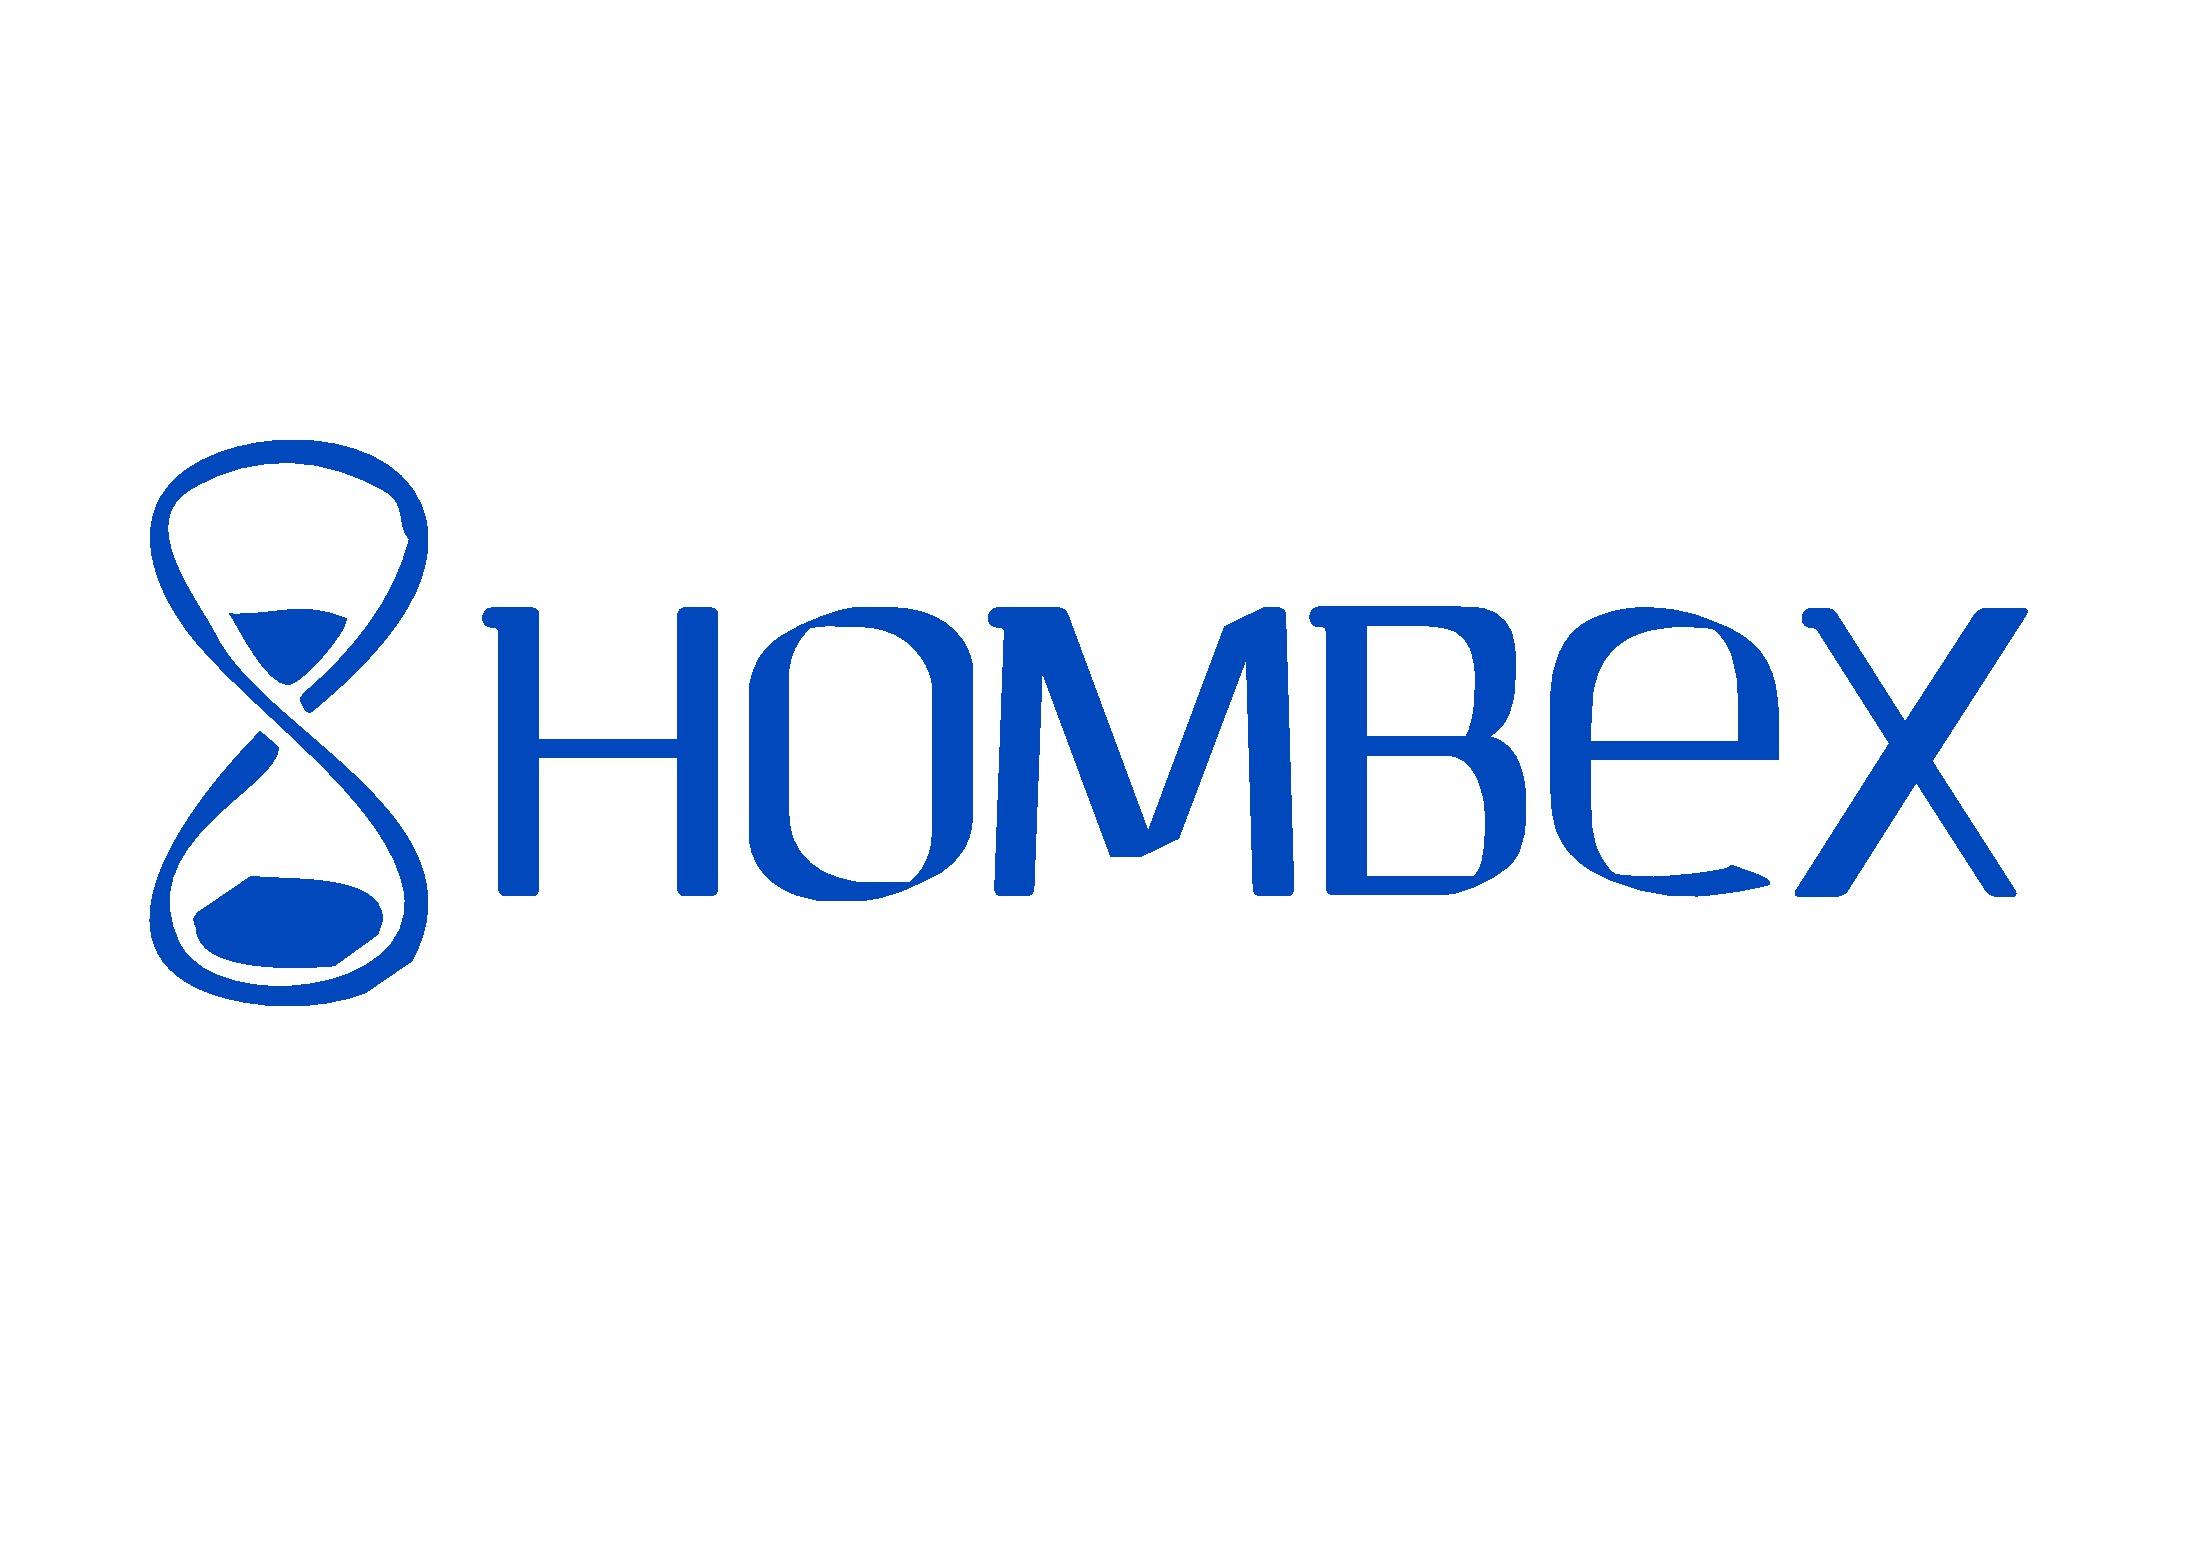 Hombex